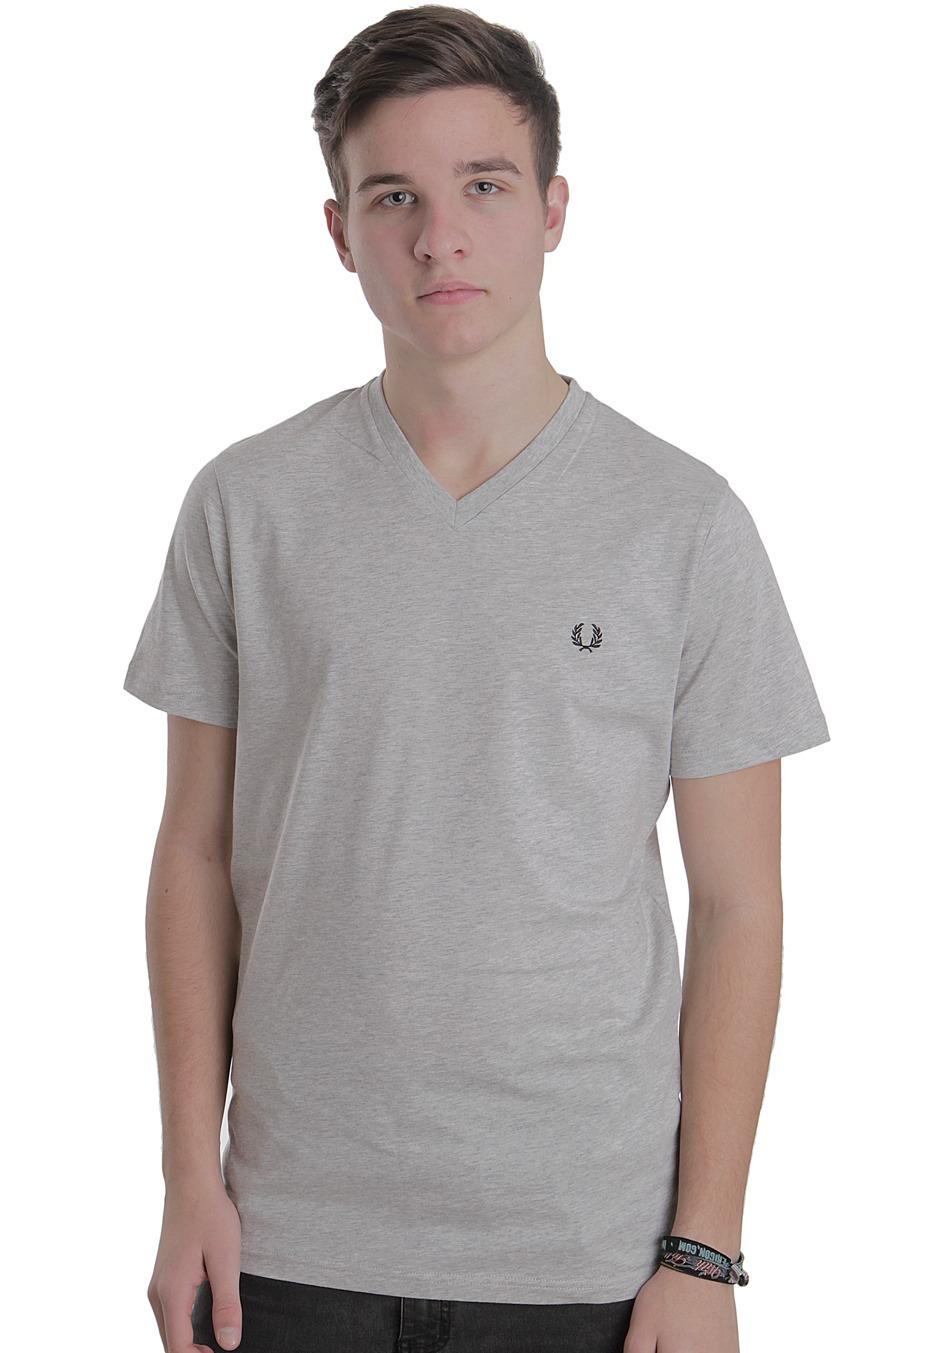 08138b68 Fred Perry - Plain Marl Grey - V Neck T-Shirt - Streetwear Shop -  Impericon.com Worldwide